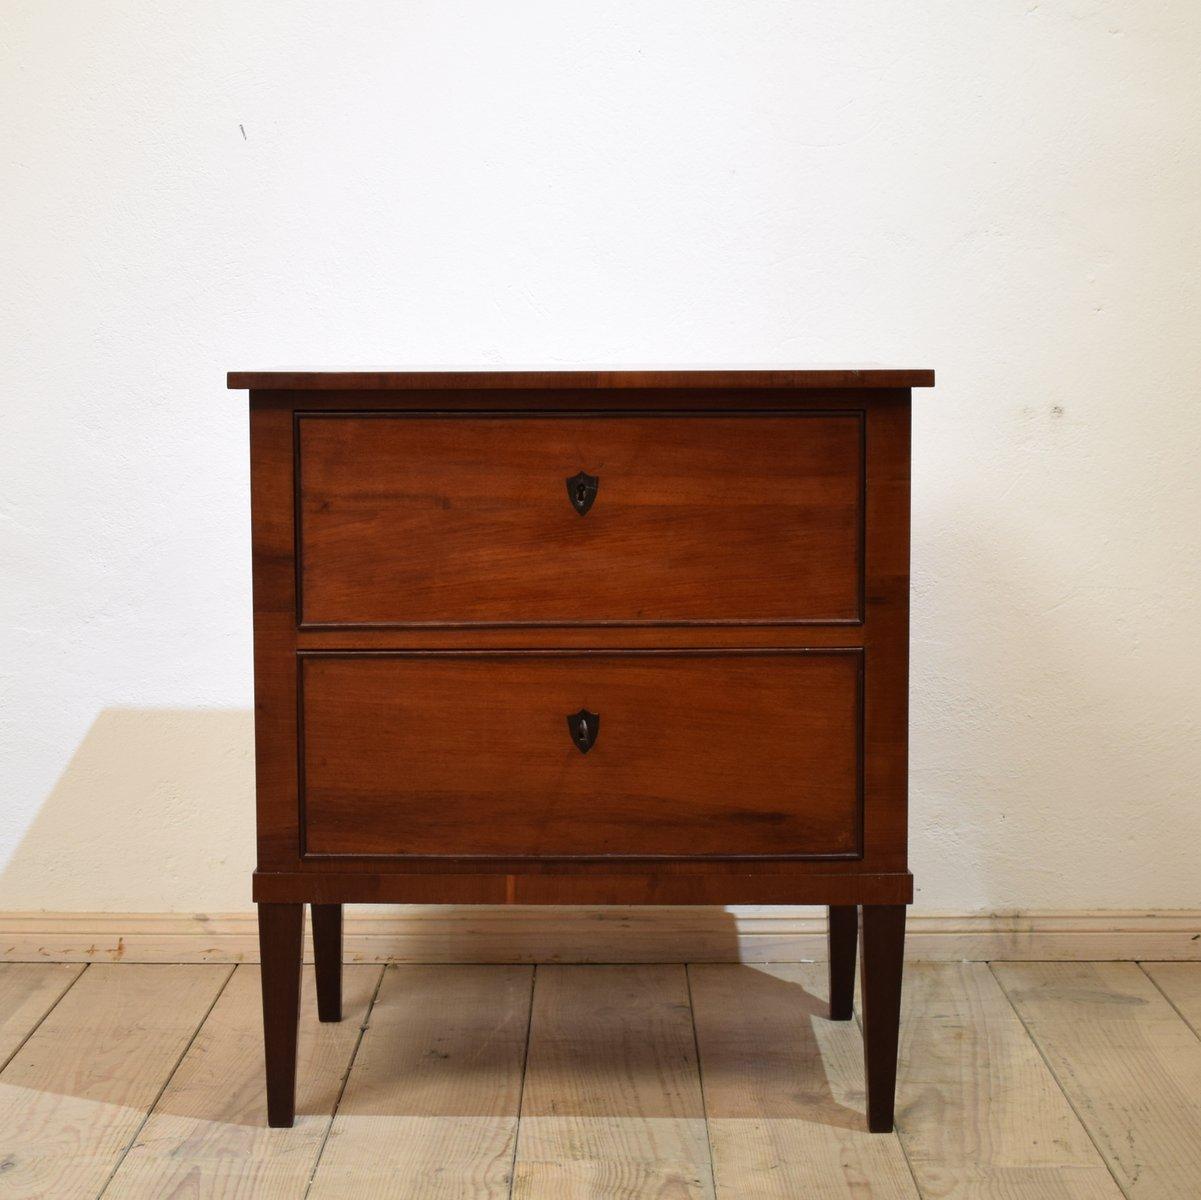 biedermeier mahagoni kommode 1820er bei pamono kaufen. Black Bedroom Furniture Sets. Home Design Ideas